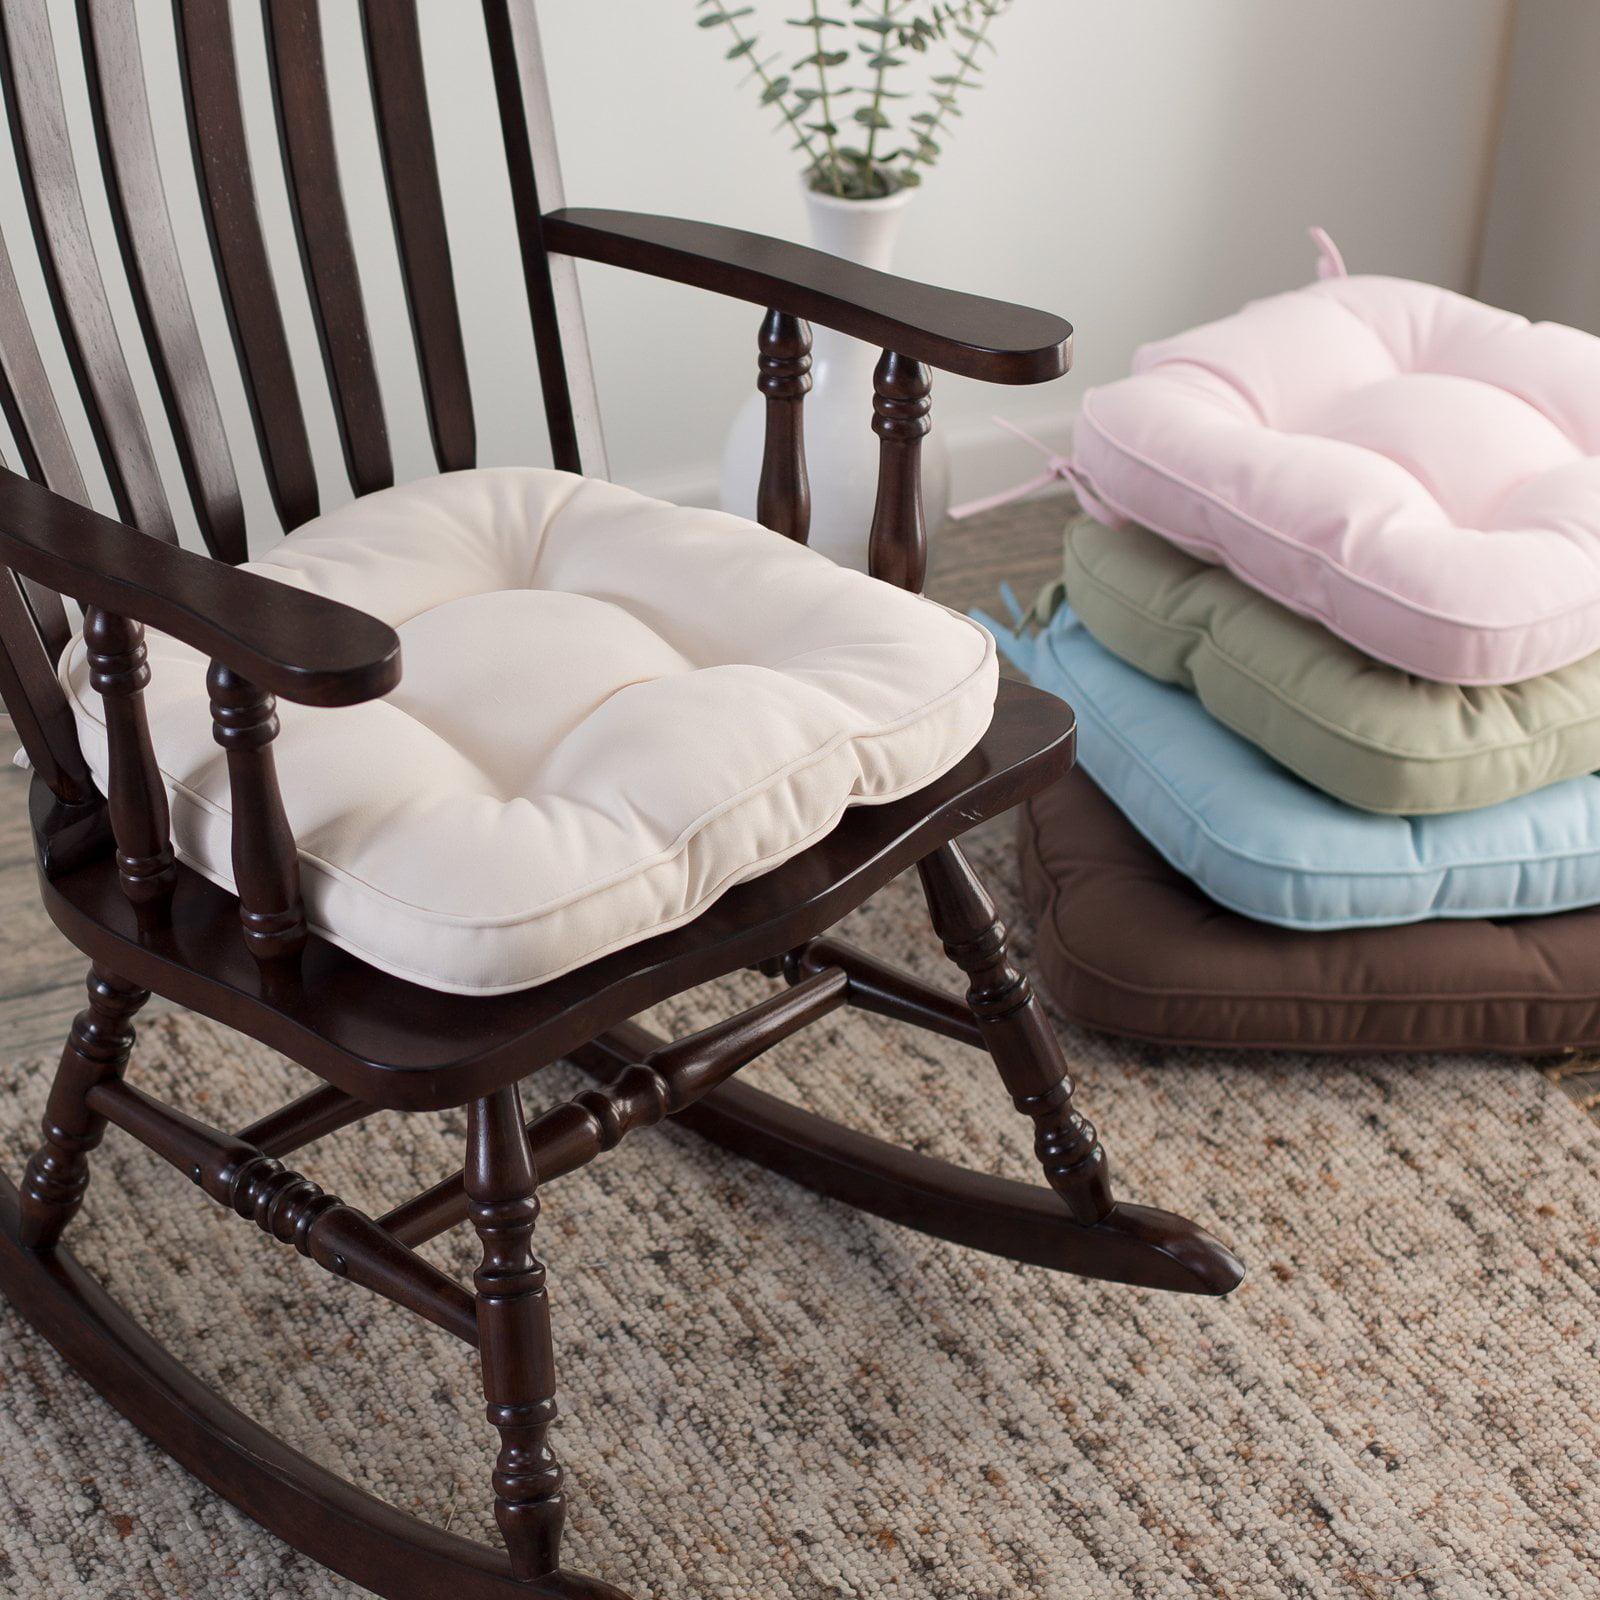 Deauville 18 x 19 Tufted Nursery Rocker Cushion